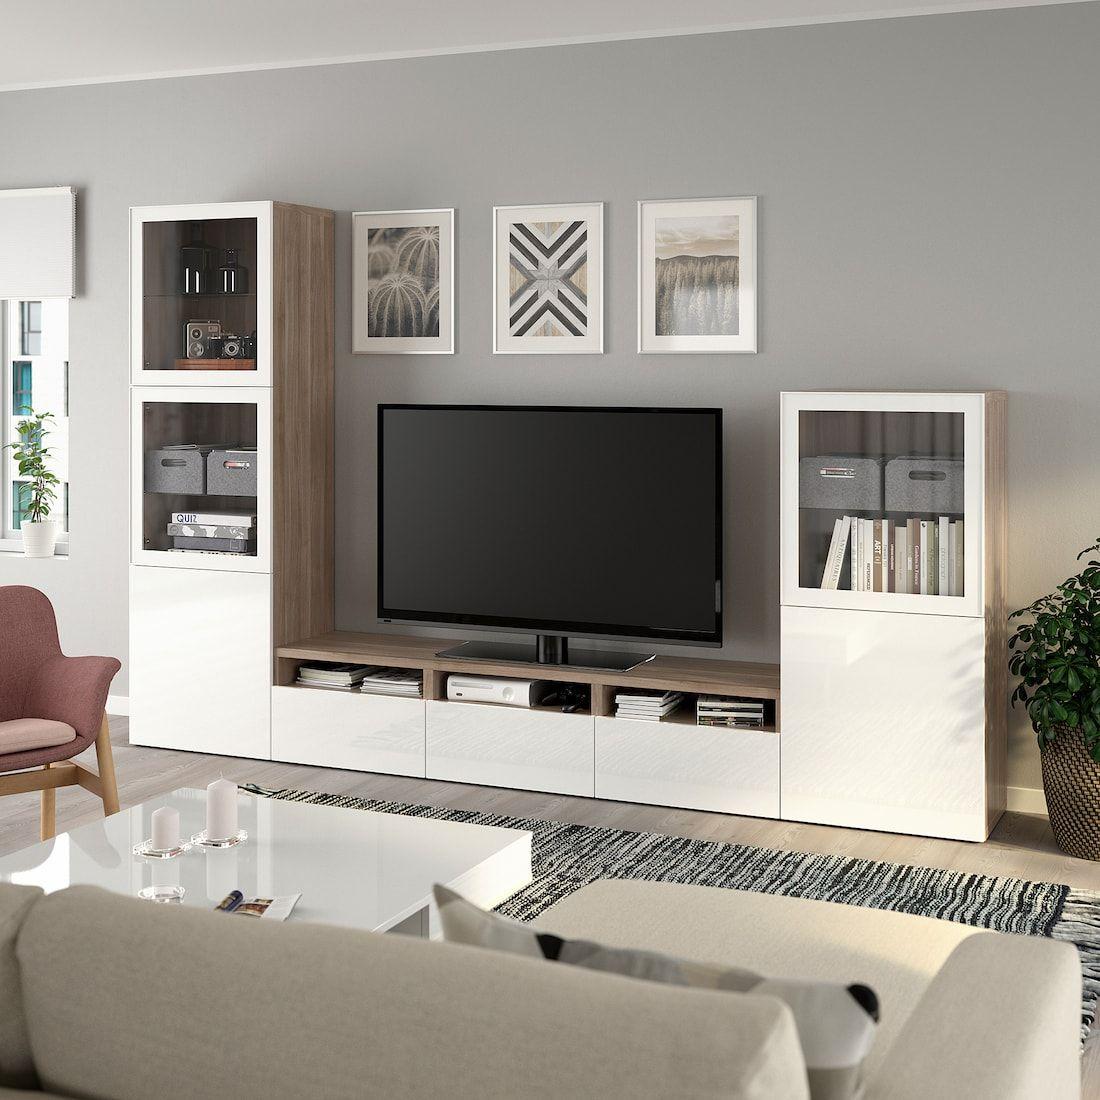 Home Furniture Store Modern Furnishings Décor Living Room Tv Tv Storage Ikea Living Room